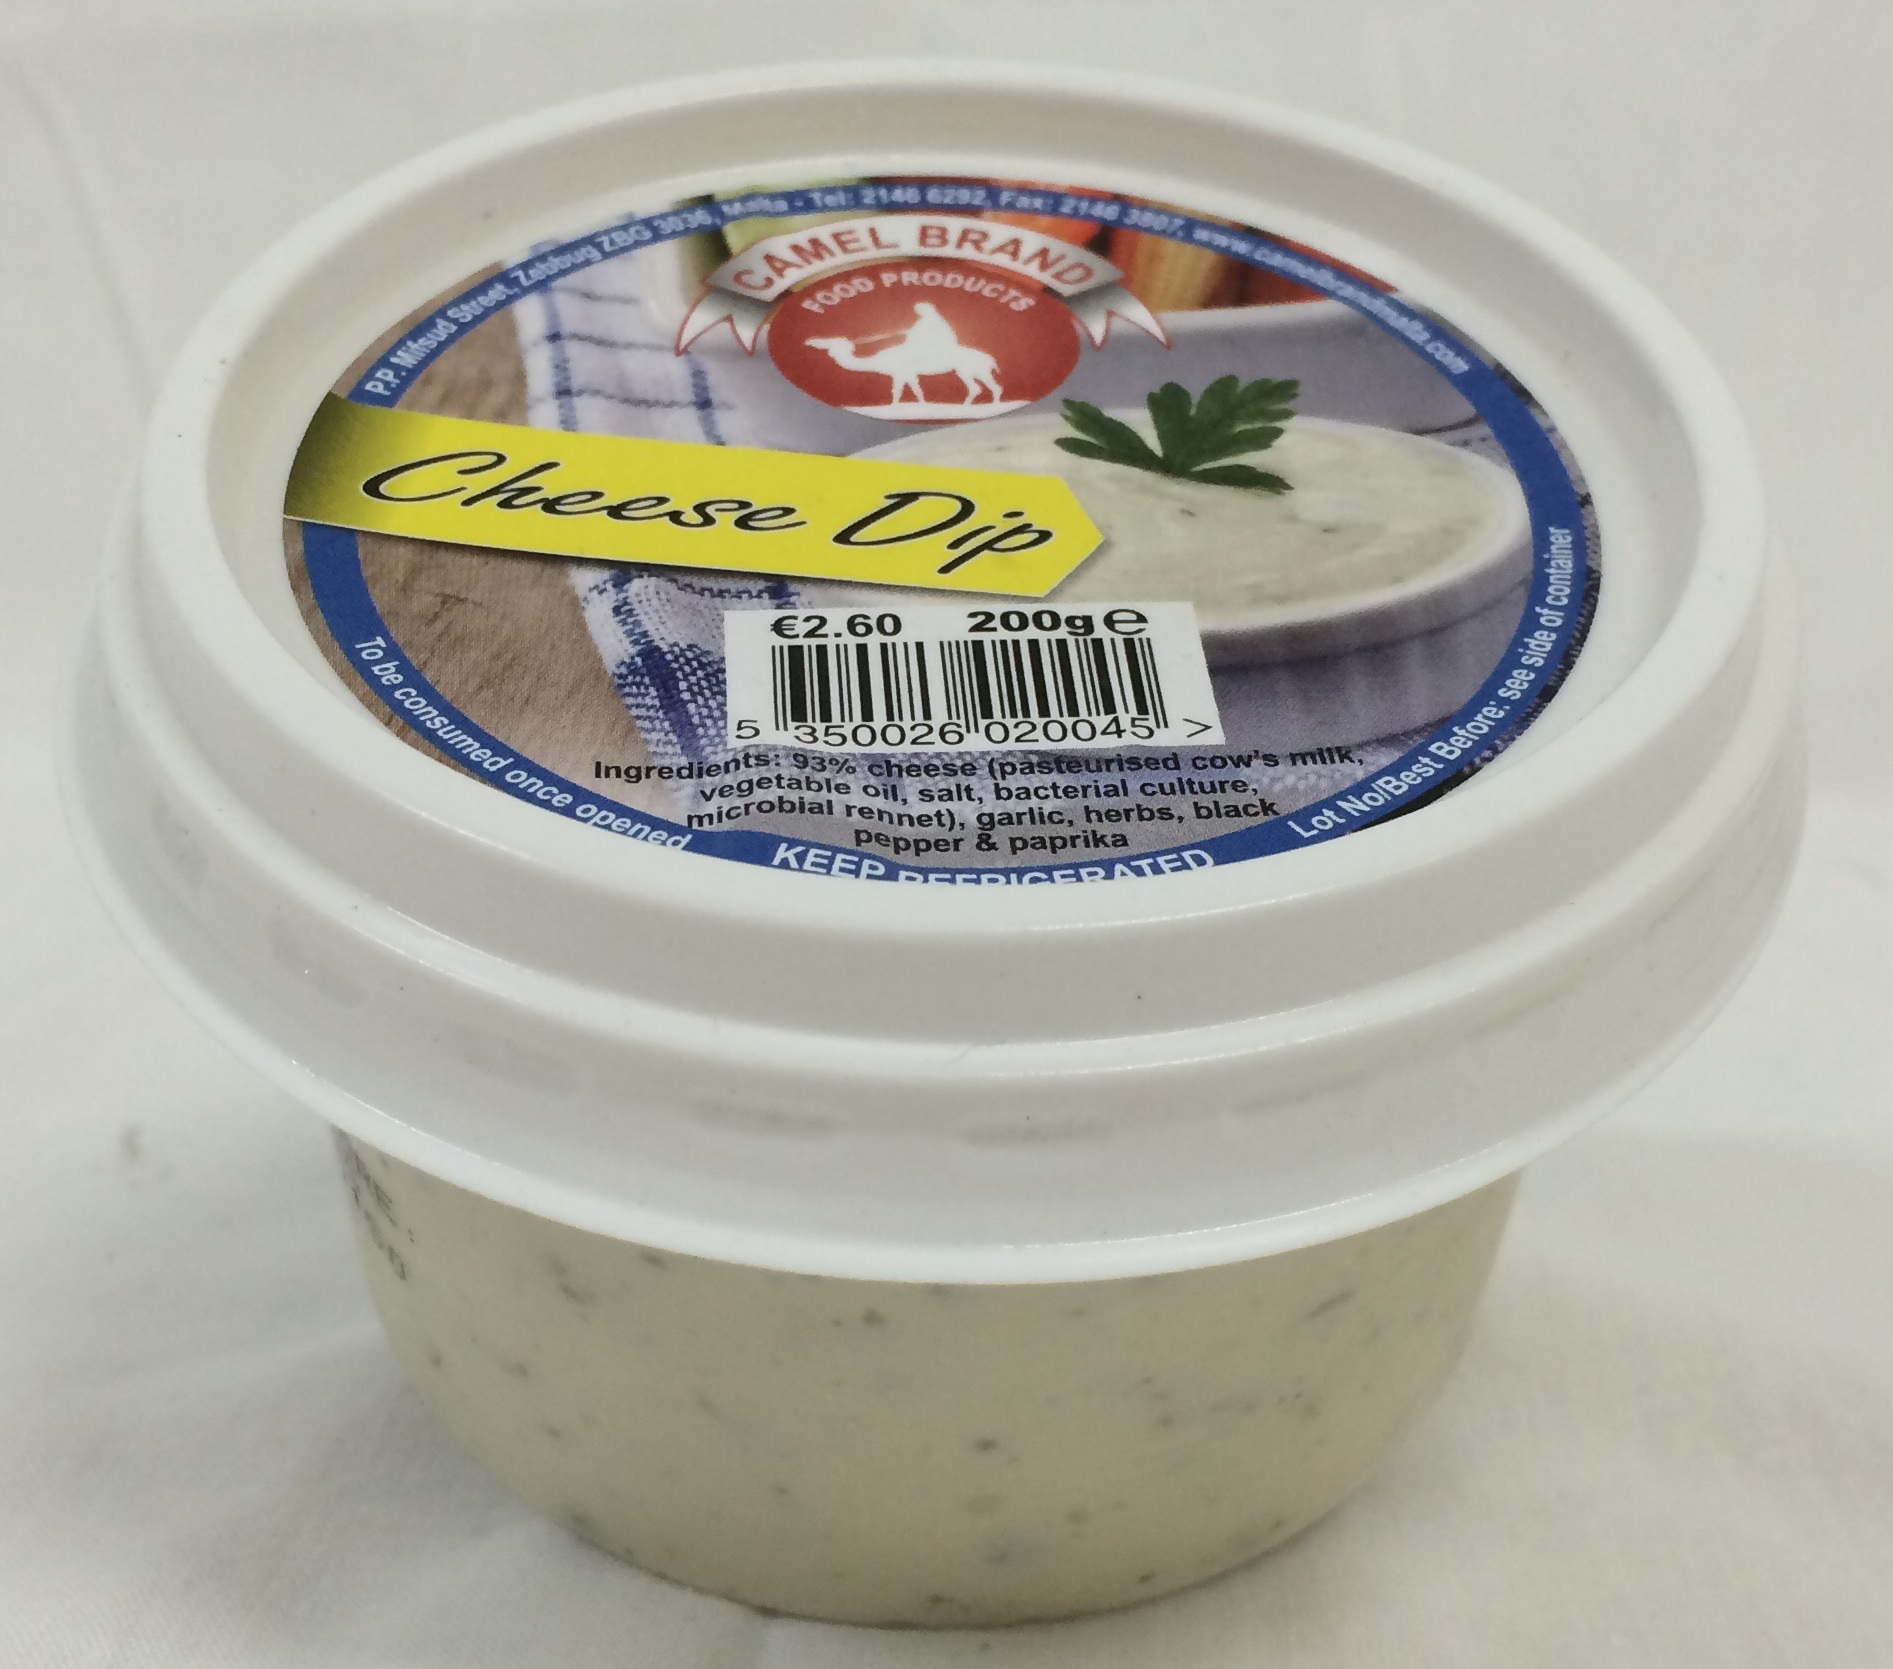 Camel Brand Cheese Dip